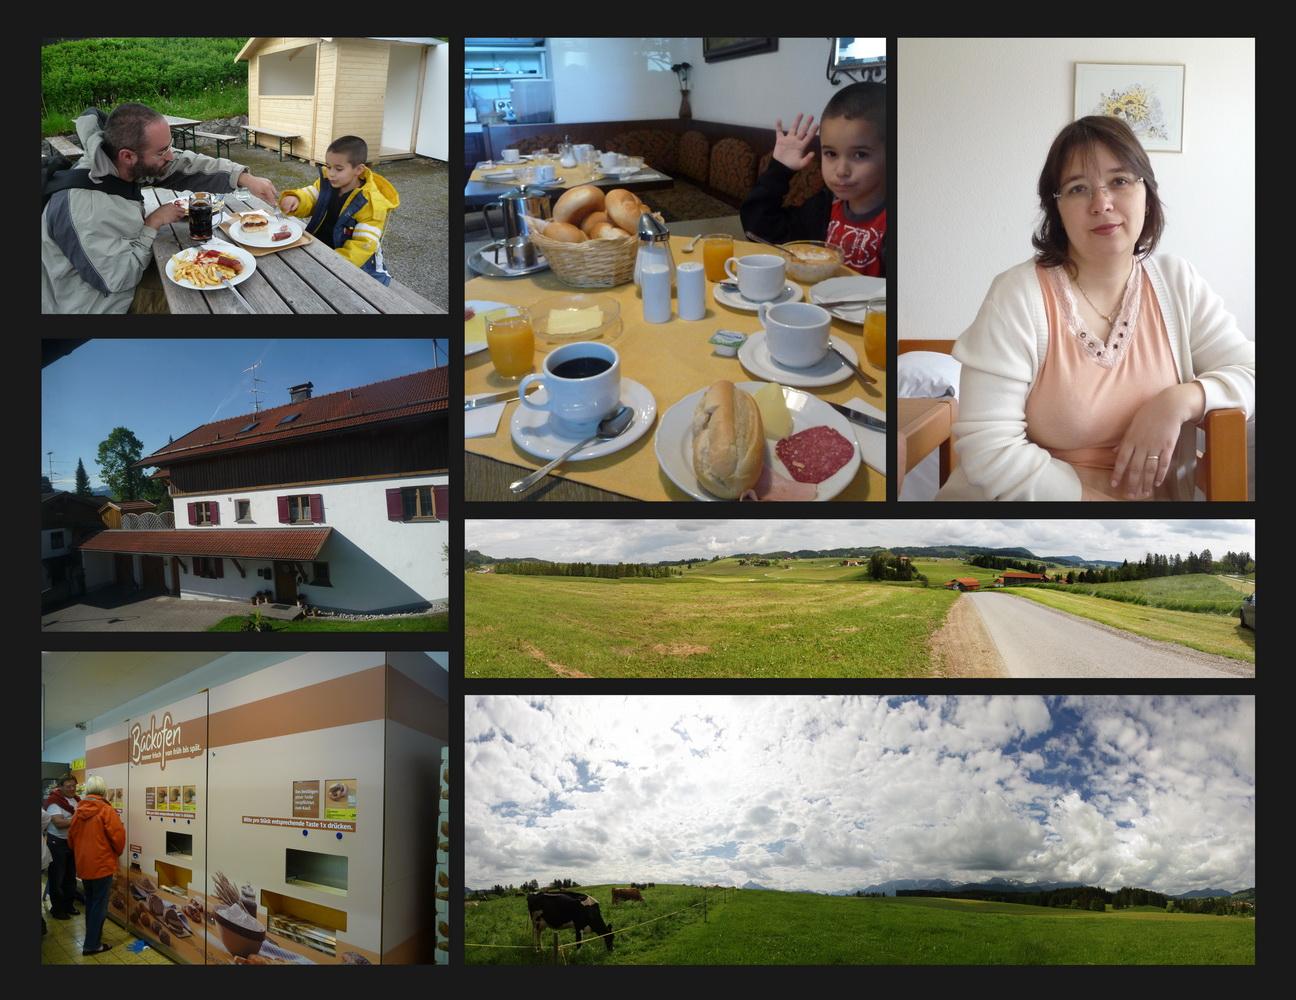 http://pics.livejournal.com/bambik/pic/0043ft4a